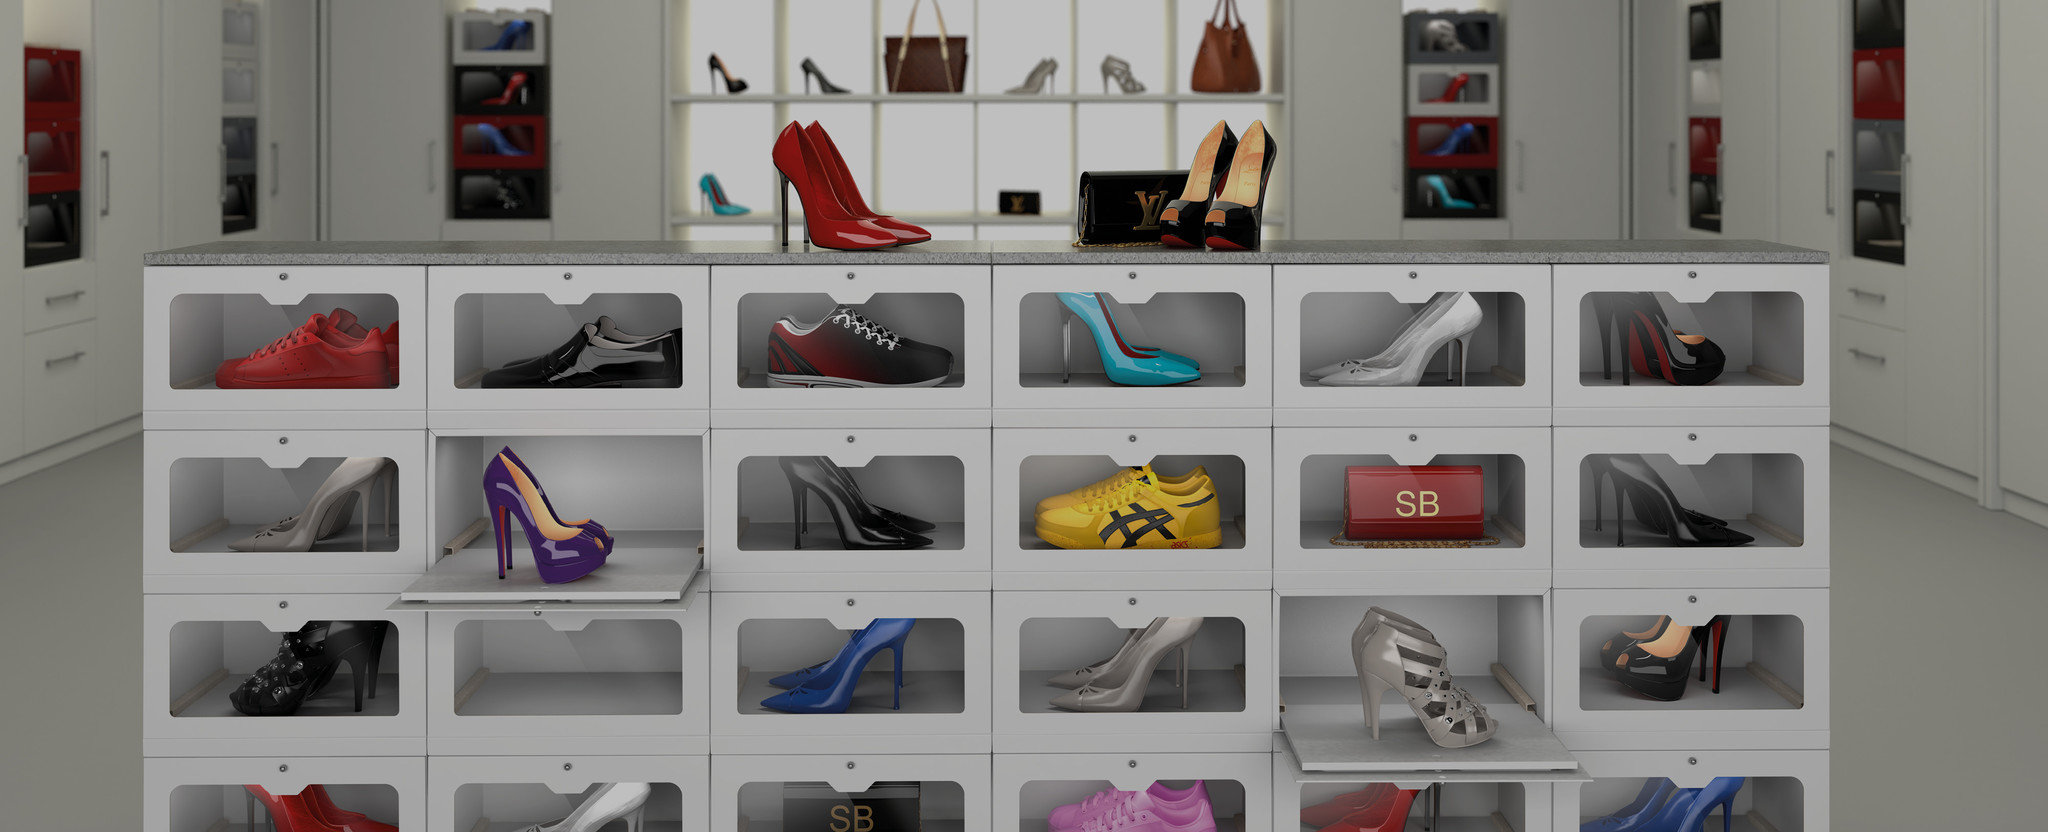 SHOWBOX - storage, modular shoebox, shoebox, Sneaker Box